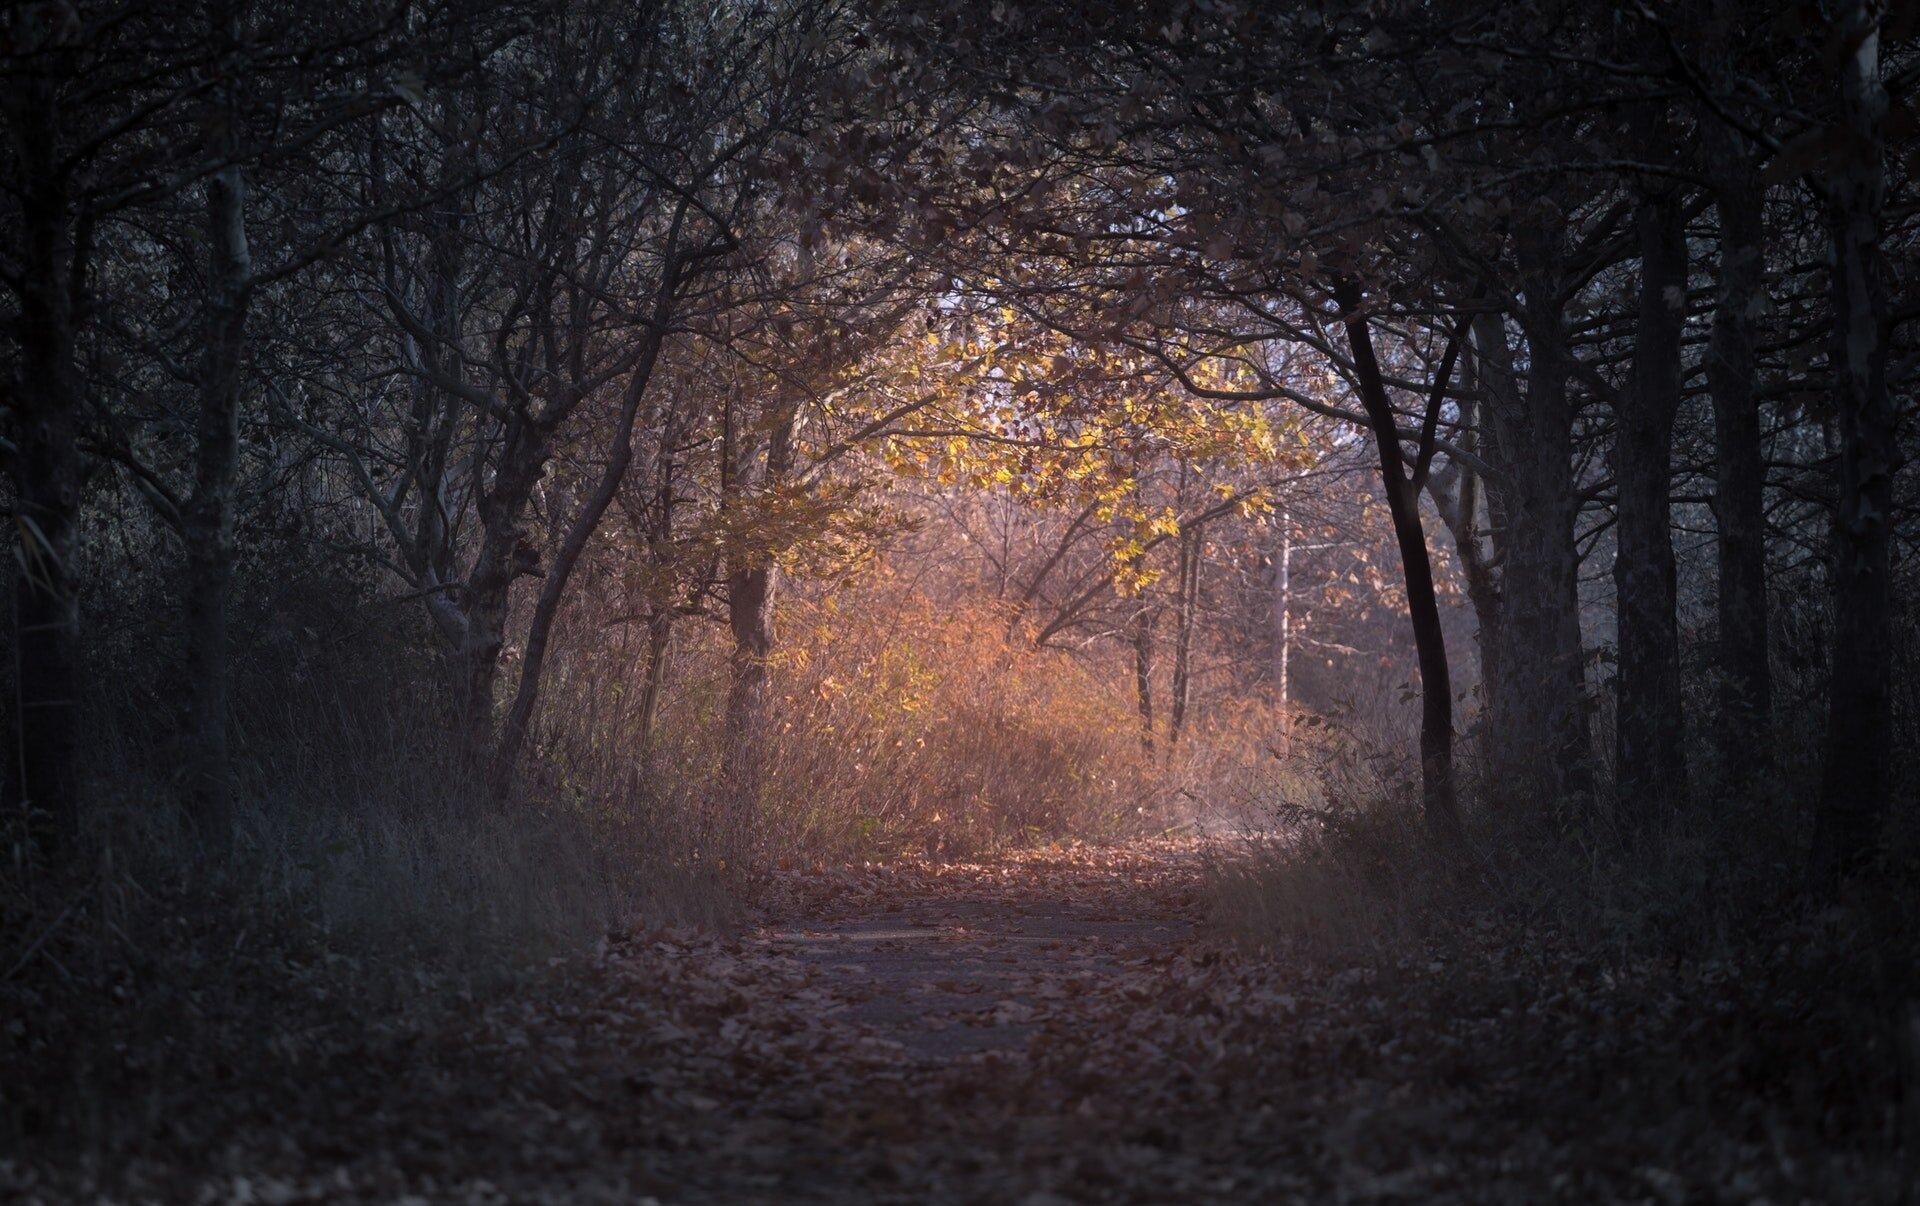 backlit-branch-dark-226721.jpg